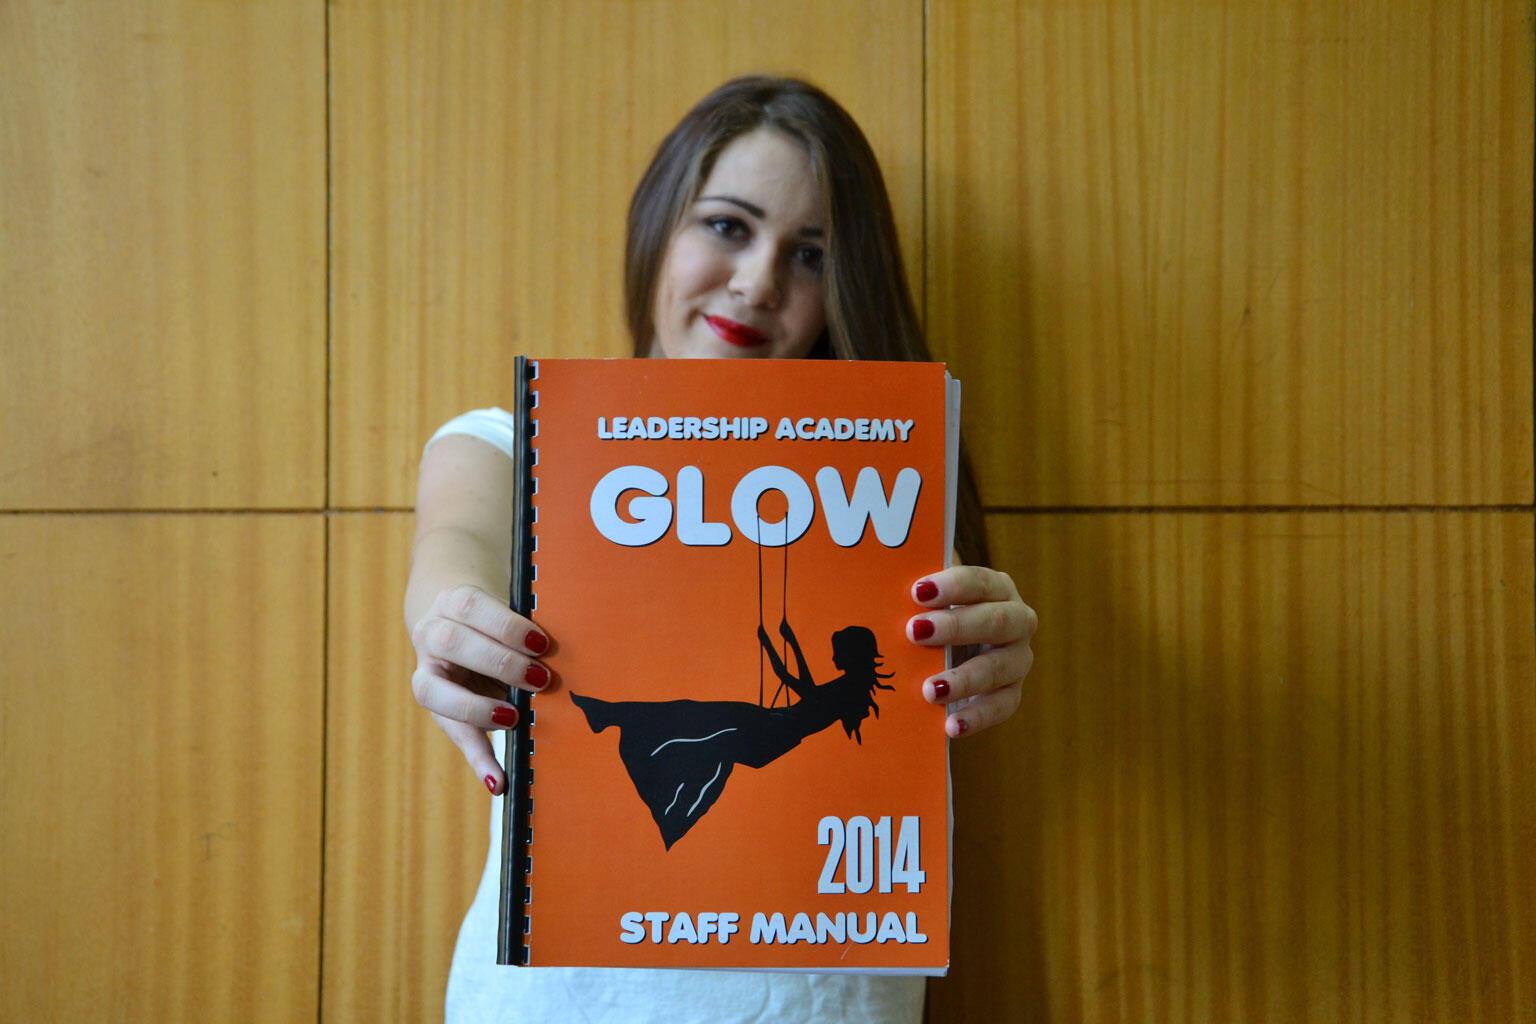 Maria Hristoforova veut promouvoir le leadership féminin.